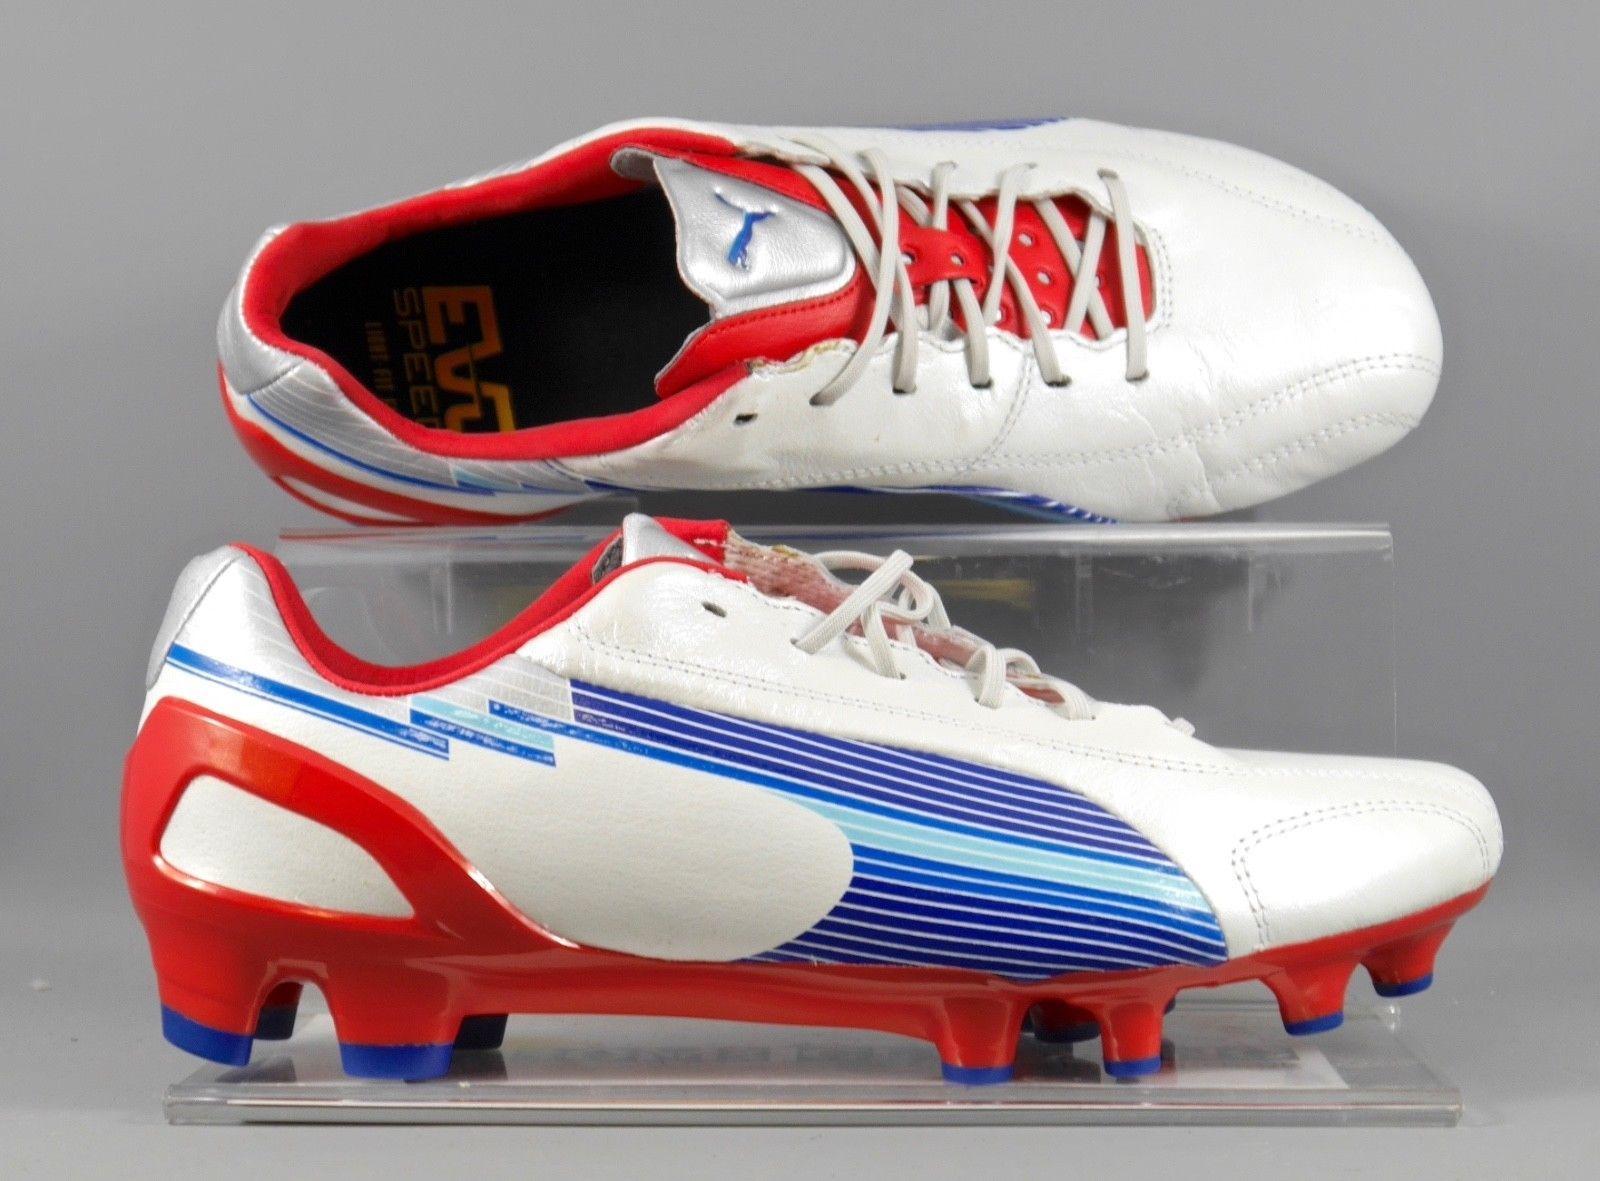 3545b3266 102525-01 Puma EvoSpeed 1 K FG , kangaroo leather firm ground football boot.